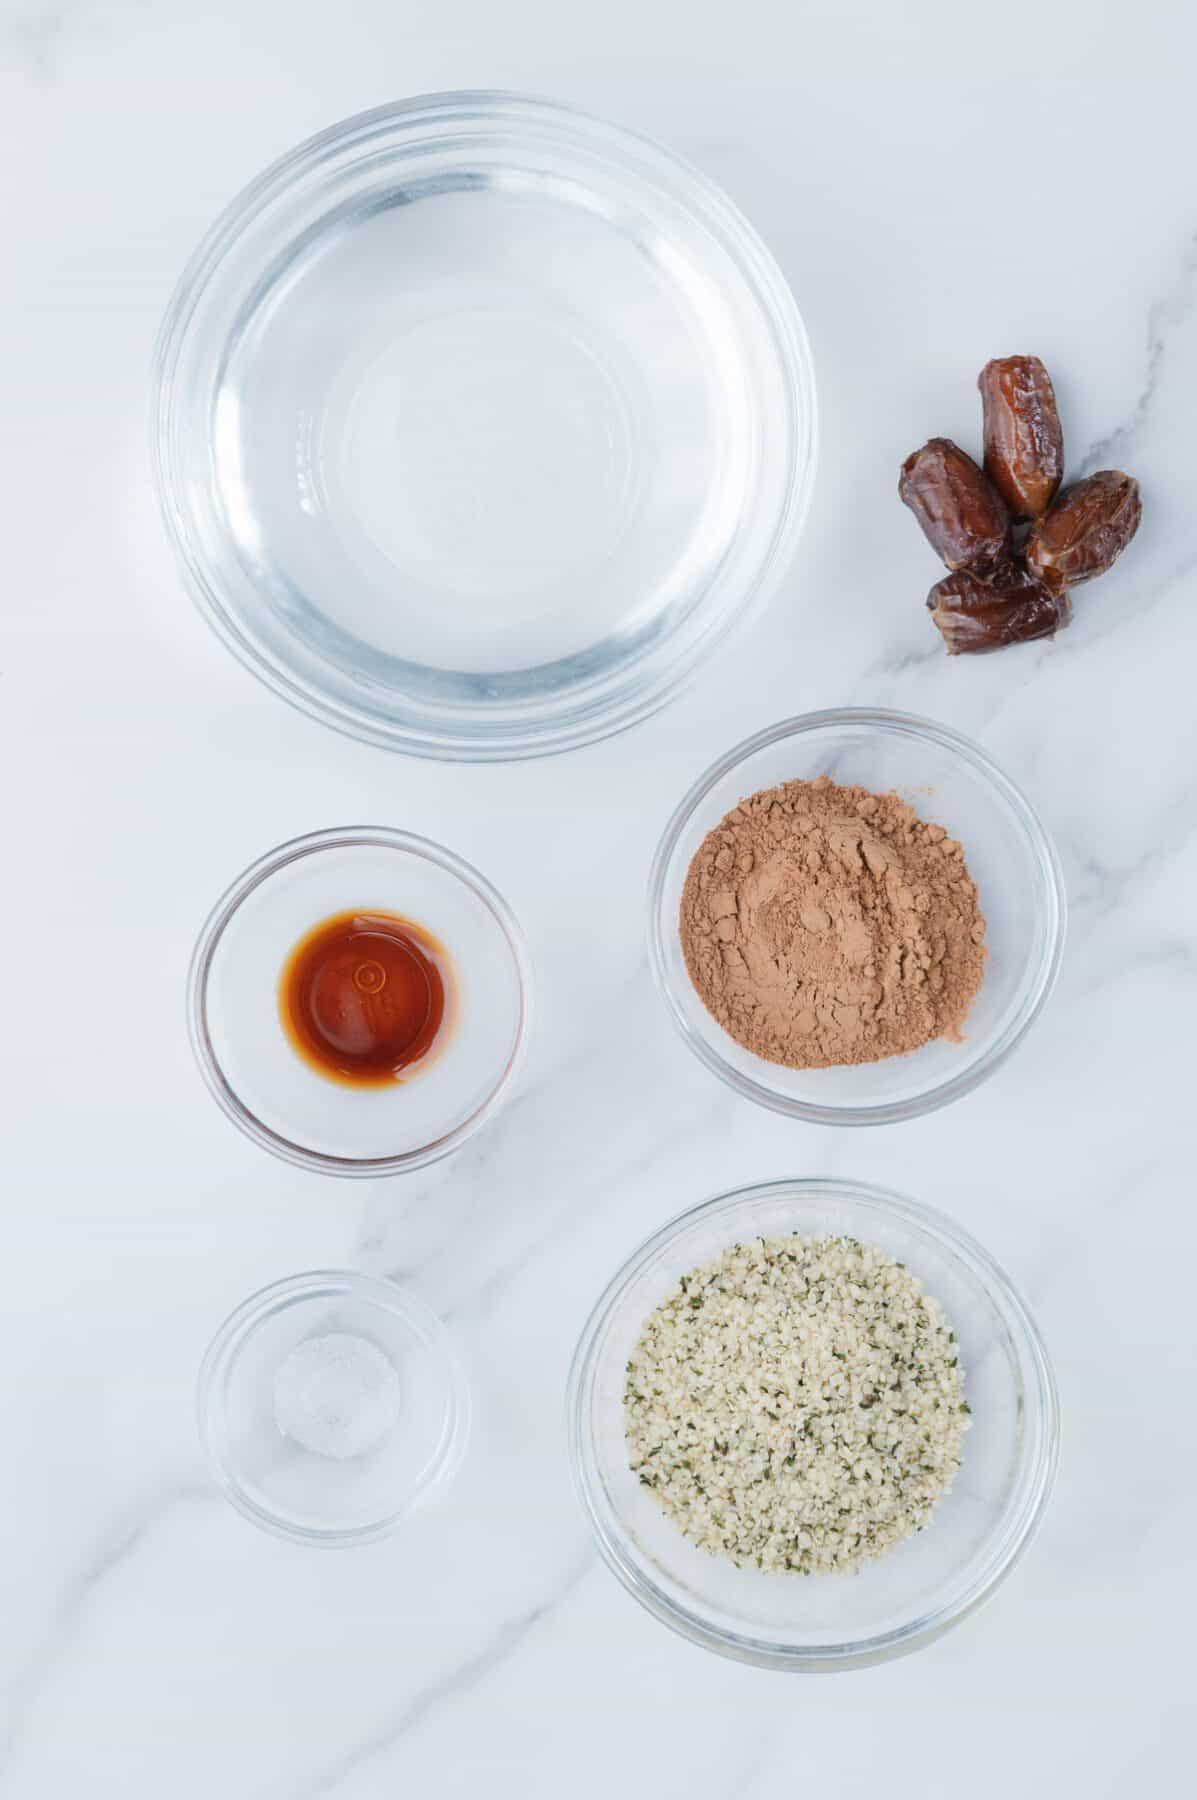 Hemp Chocolate Milk Ingredients